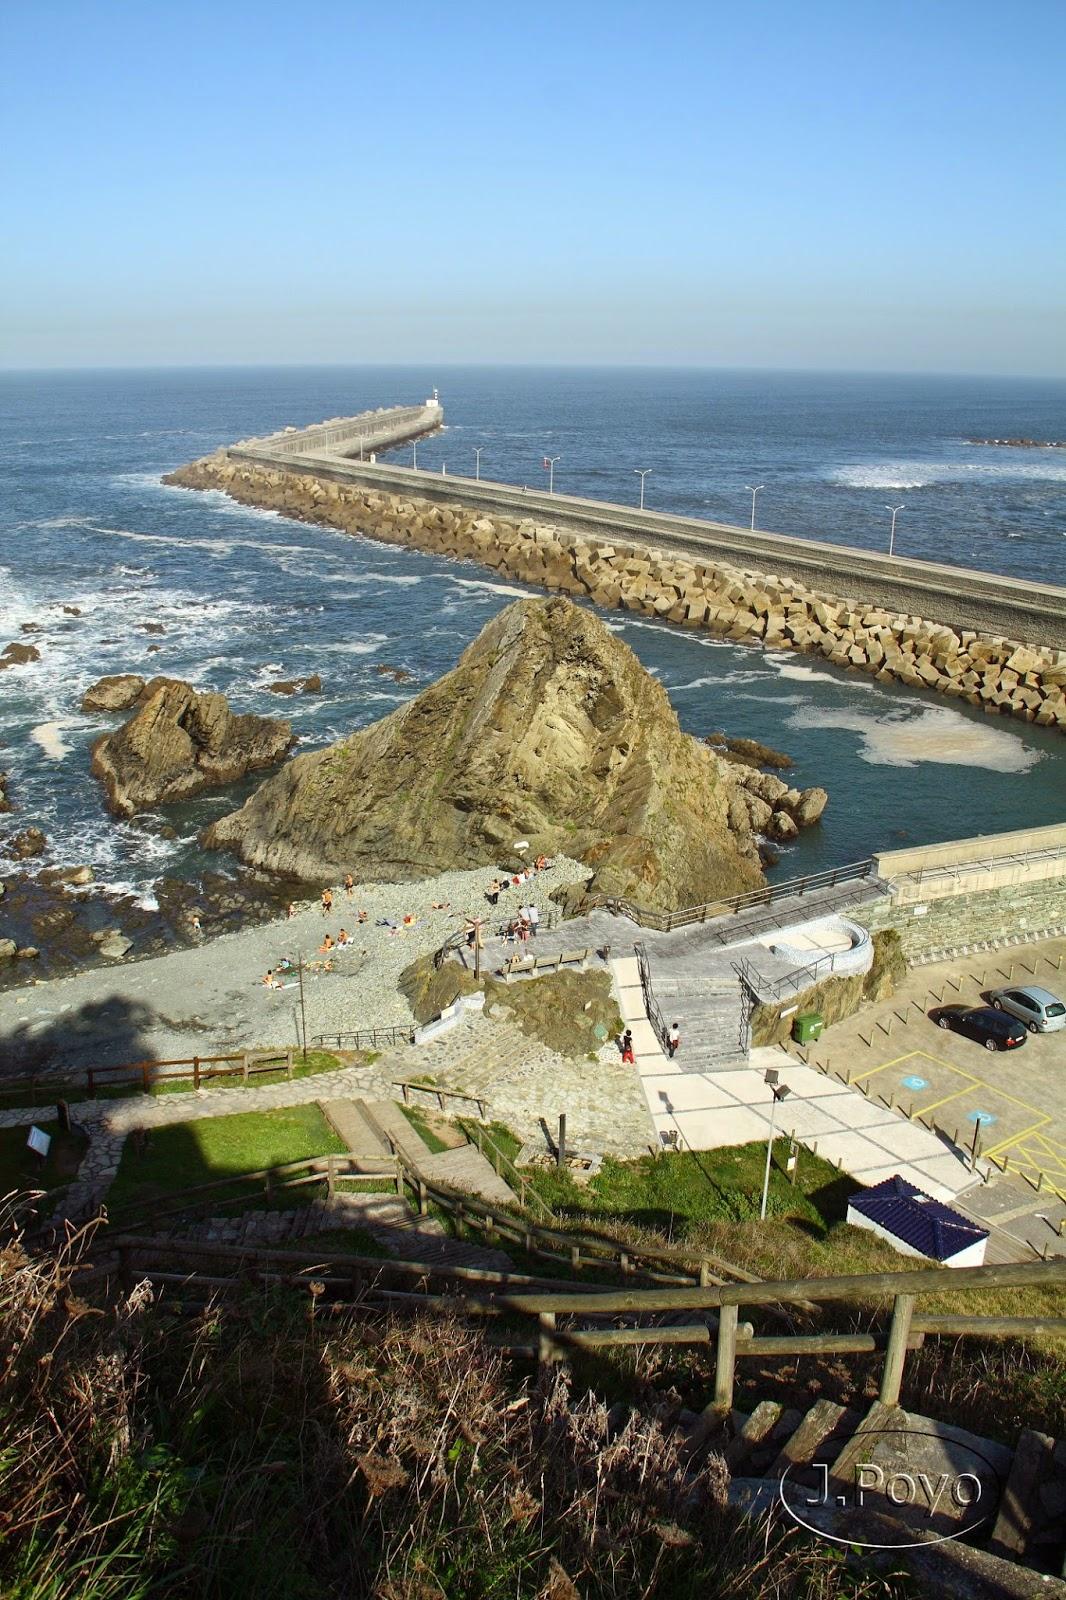 Senda Costera de Muros del Nalón o Ruta de los miradores